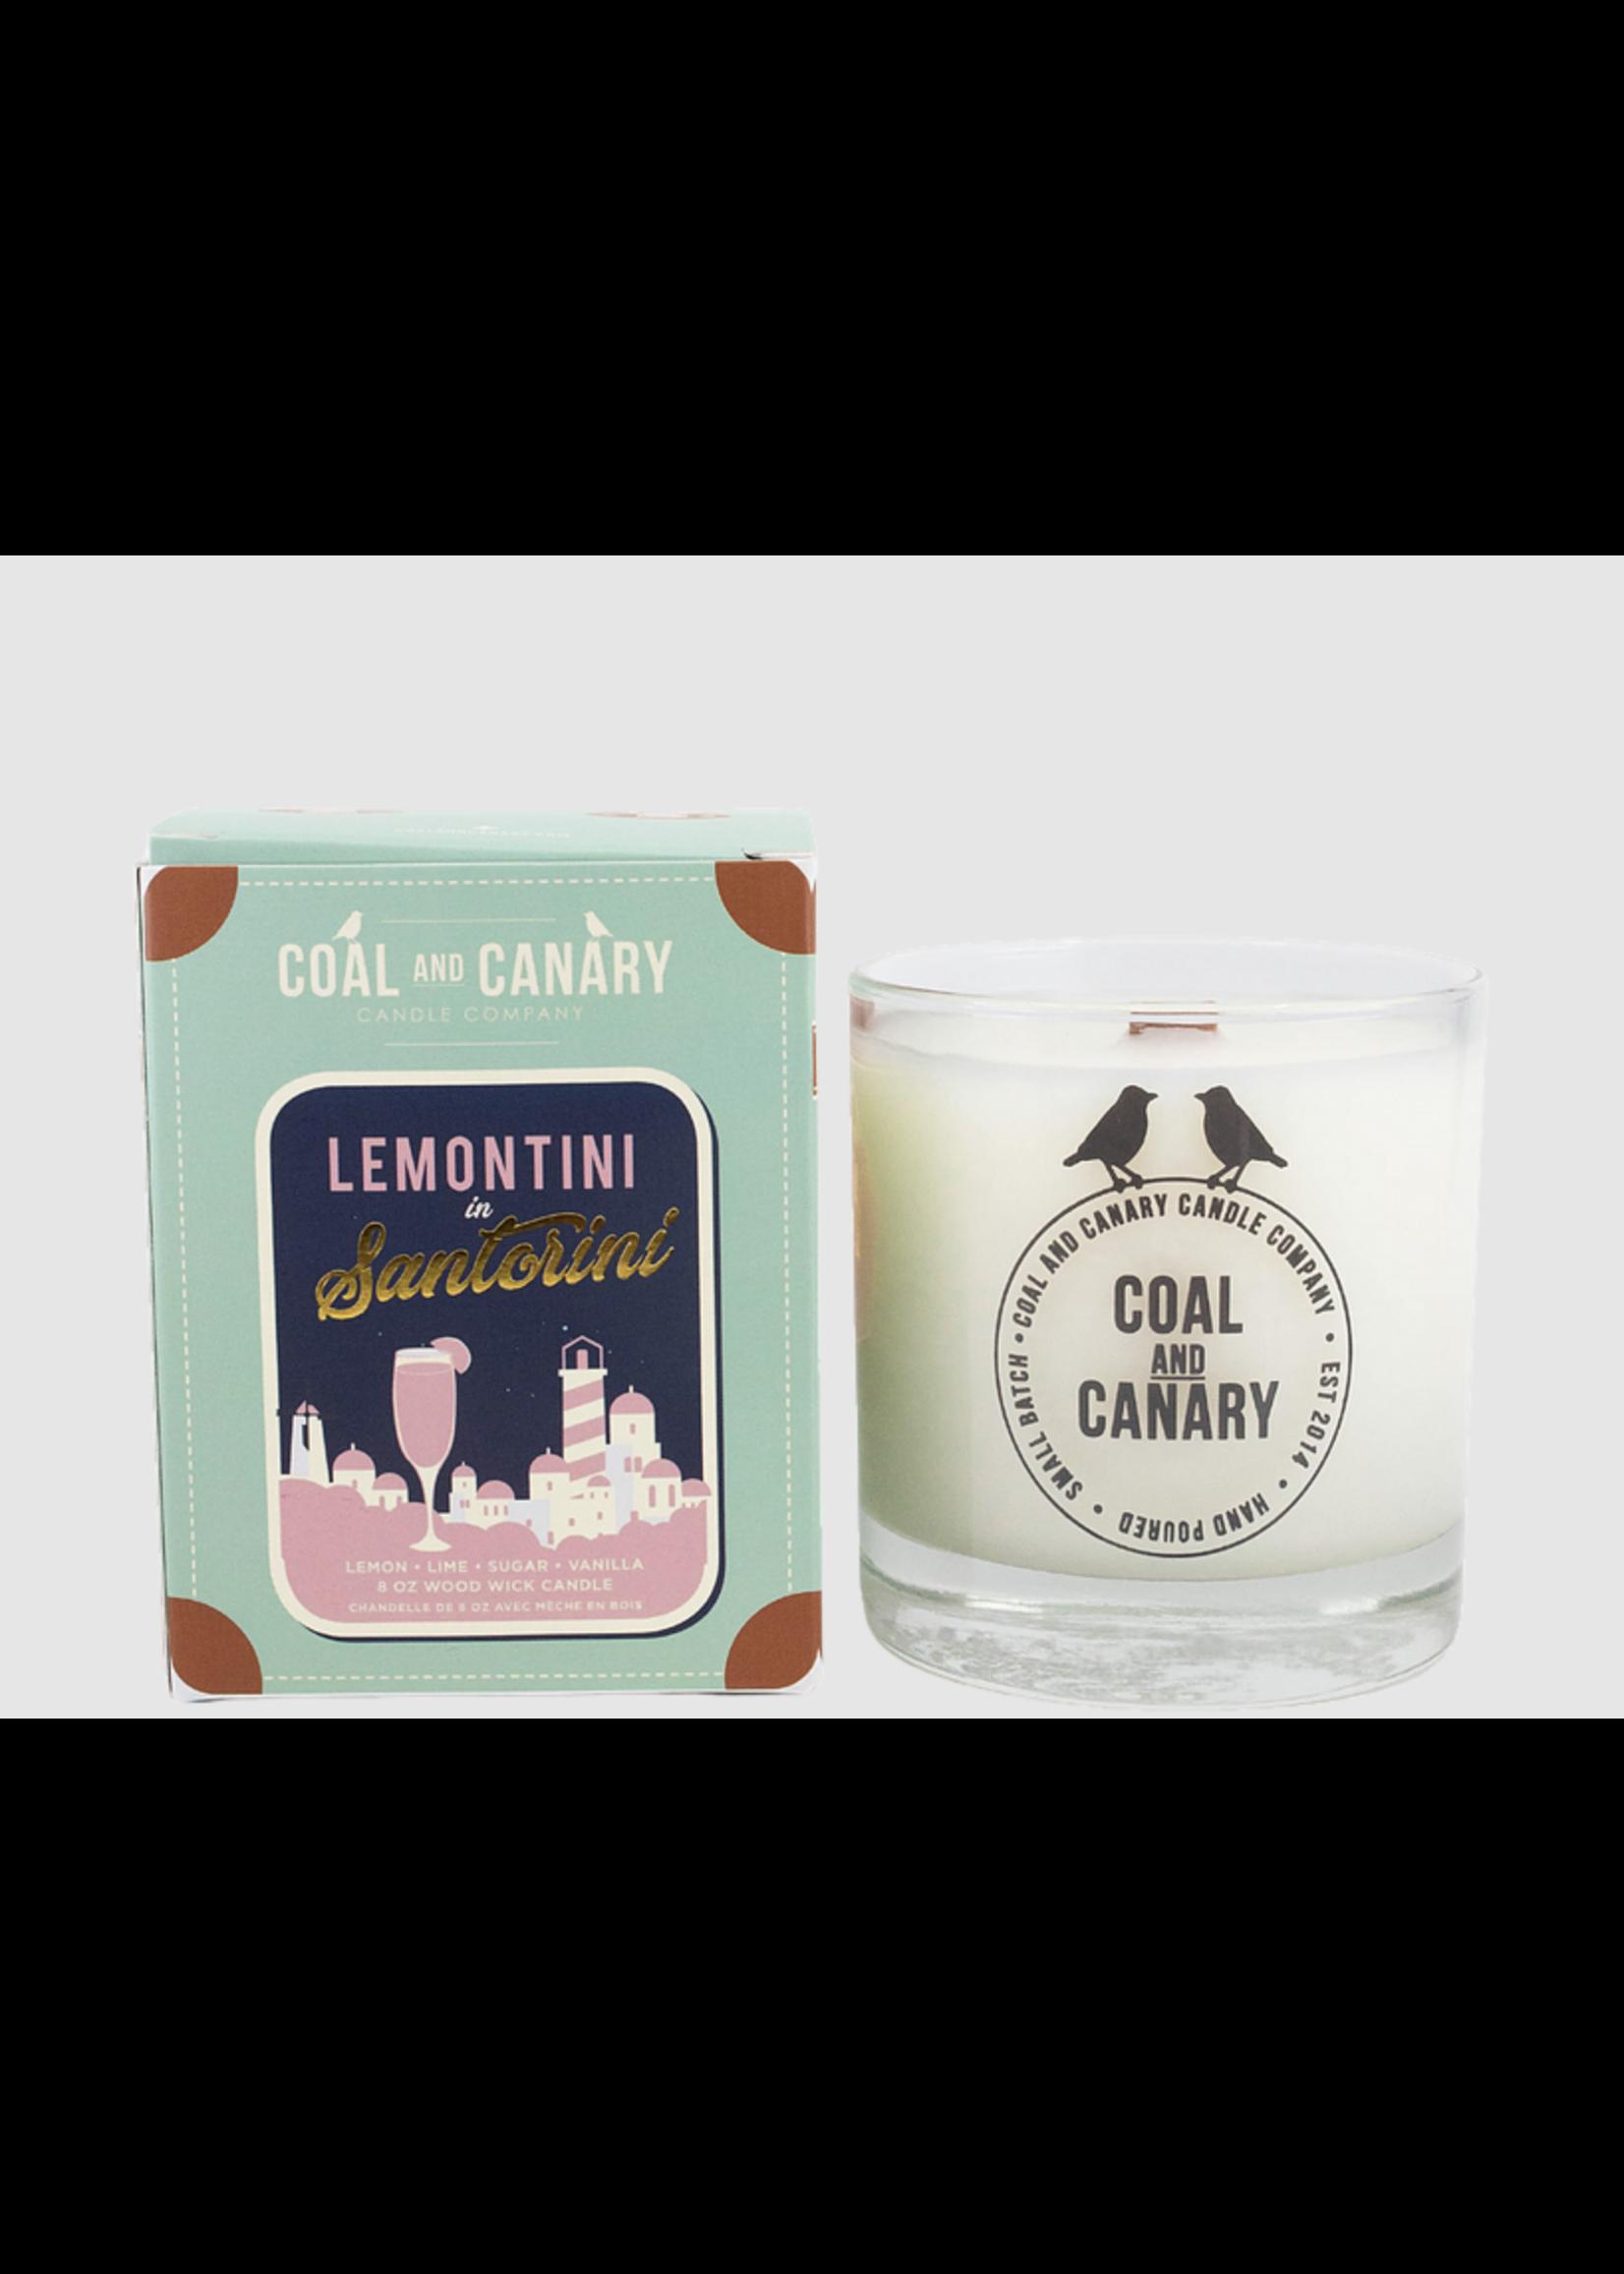 Coal and Canary Lemontini in Santtorini